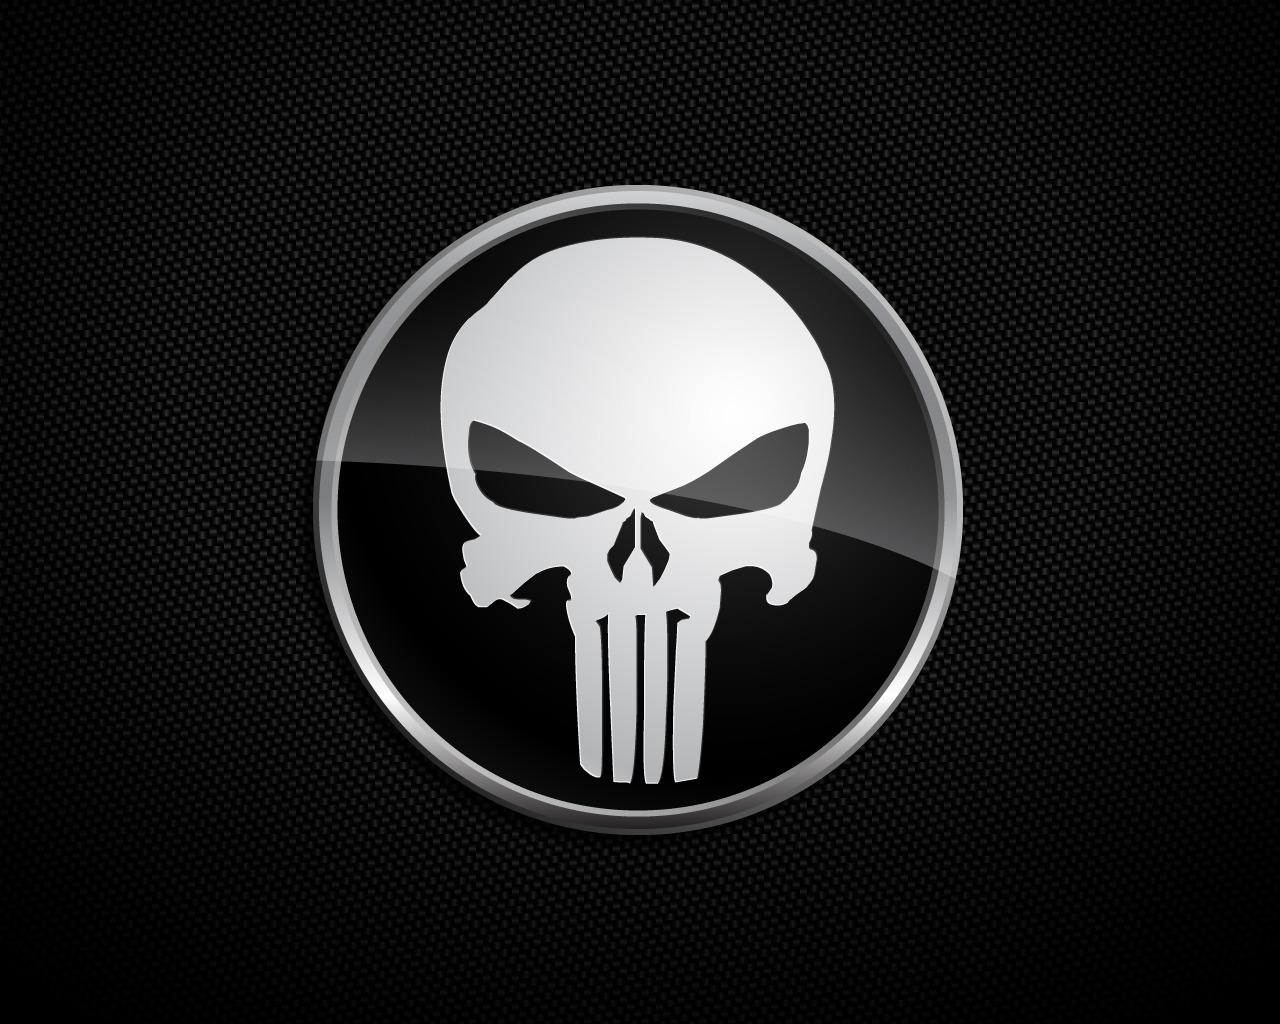 The Punisher Skull Logo HD Wallpapers | Desktop Wallpapers